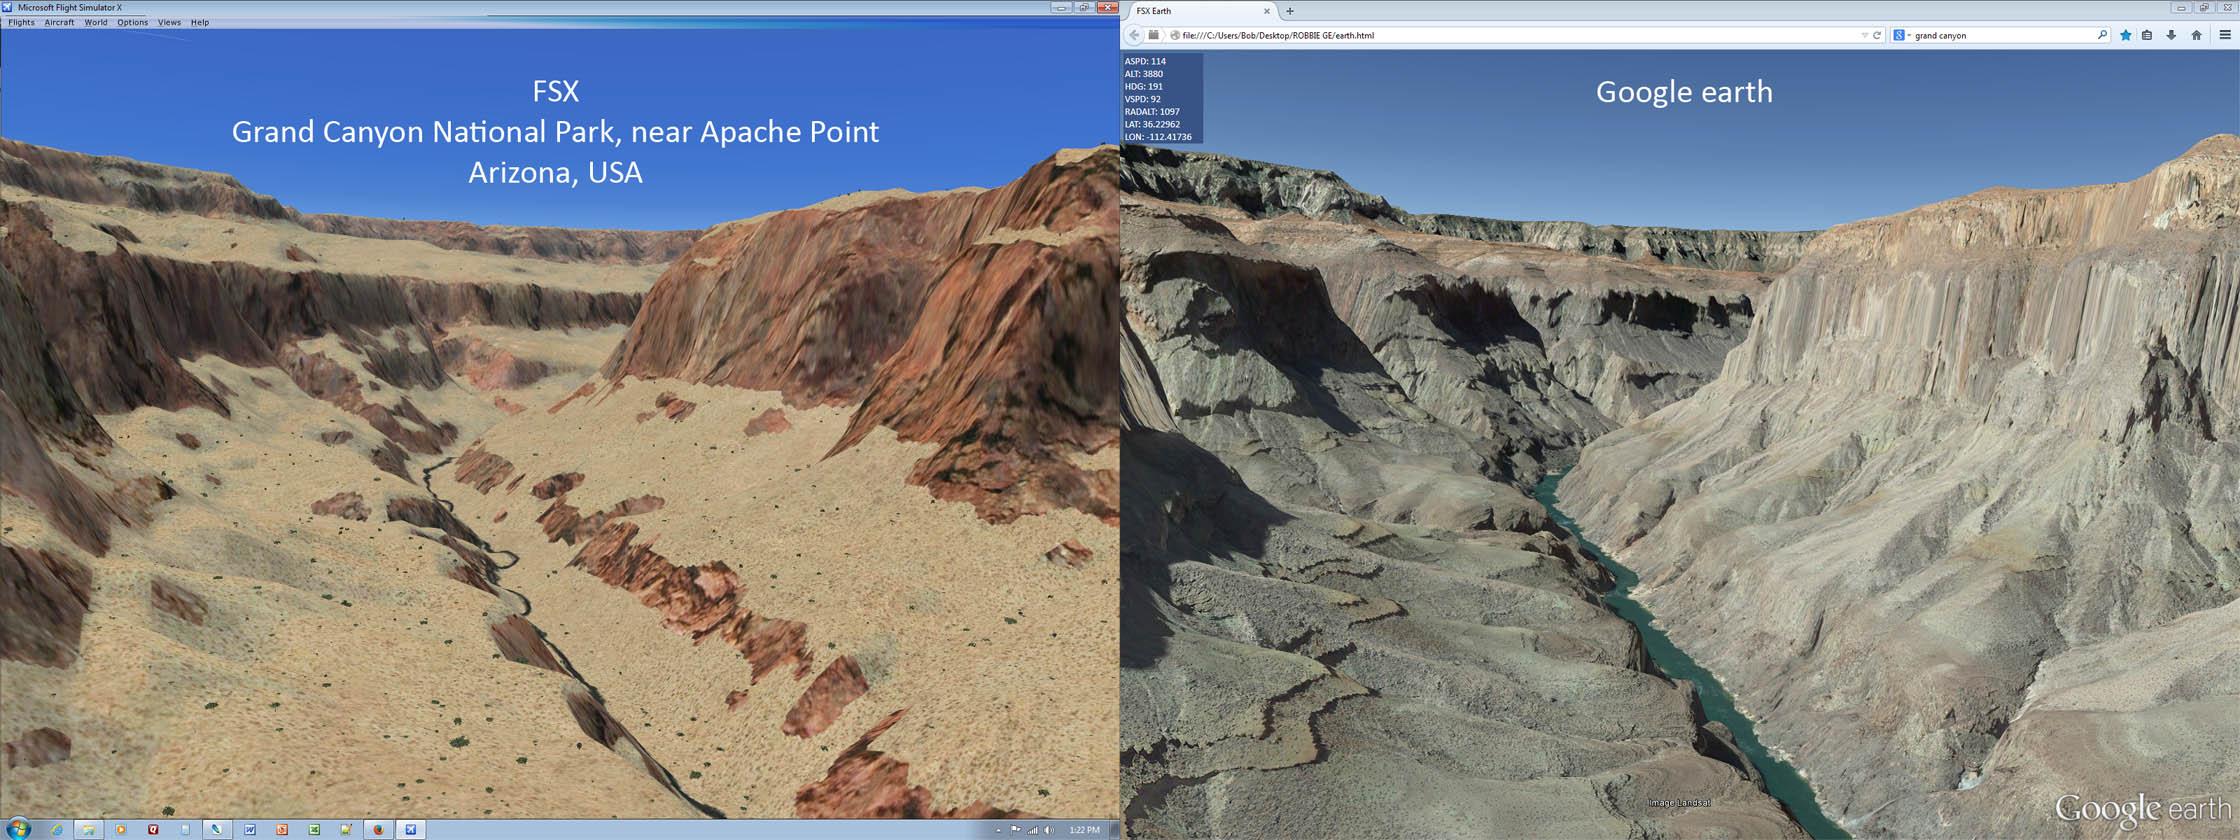 FSX - GE View: Google Earth viewer for FSX thru P3D v3 | FSDeveloper